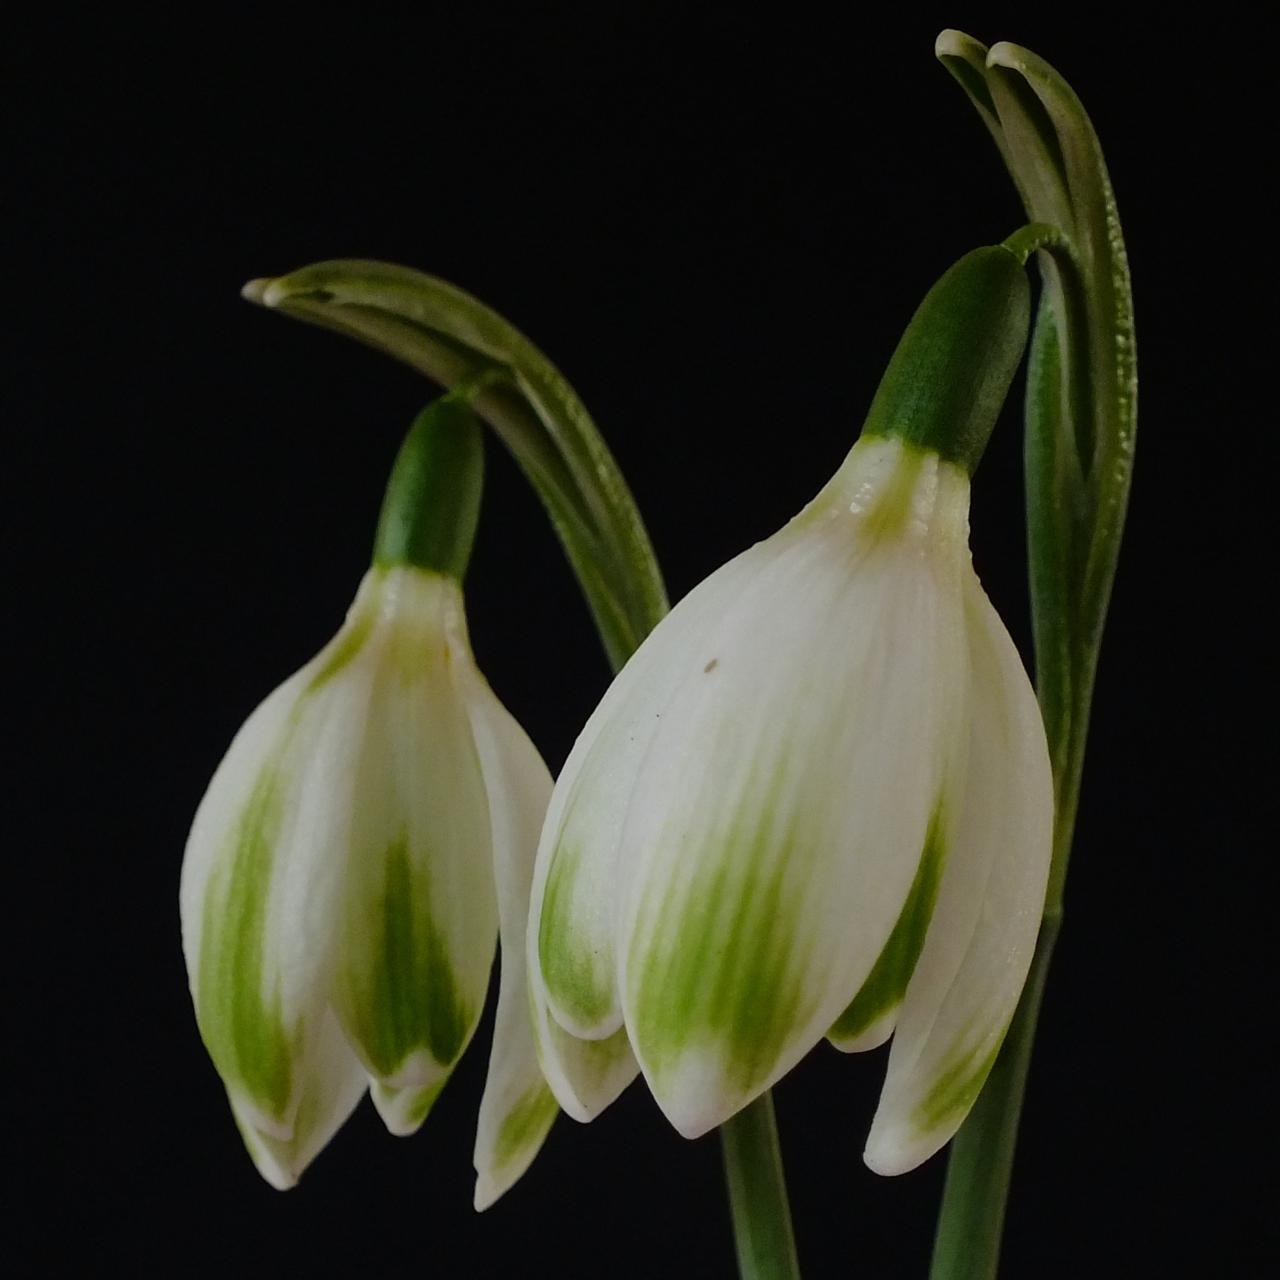 Galanthus 'Wifi Foxtrot' plant